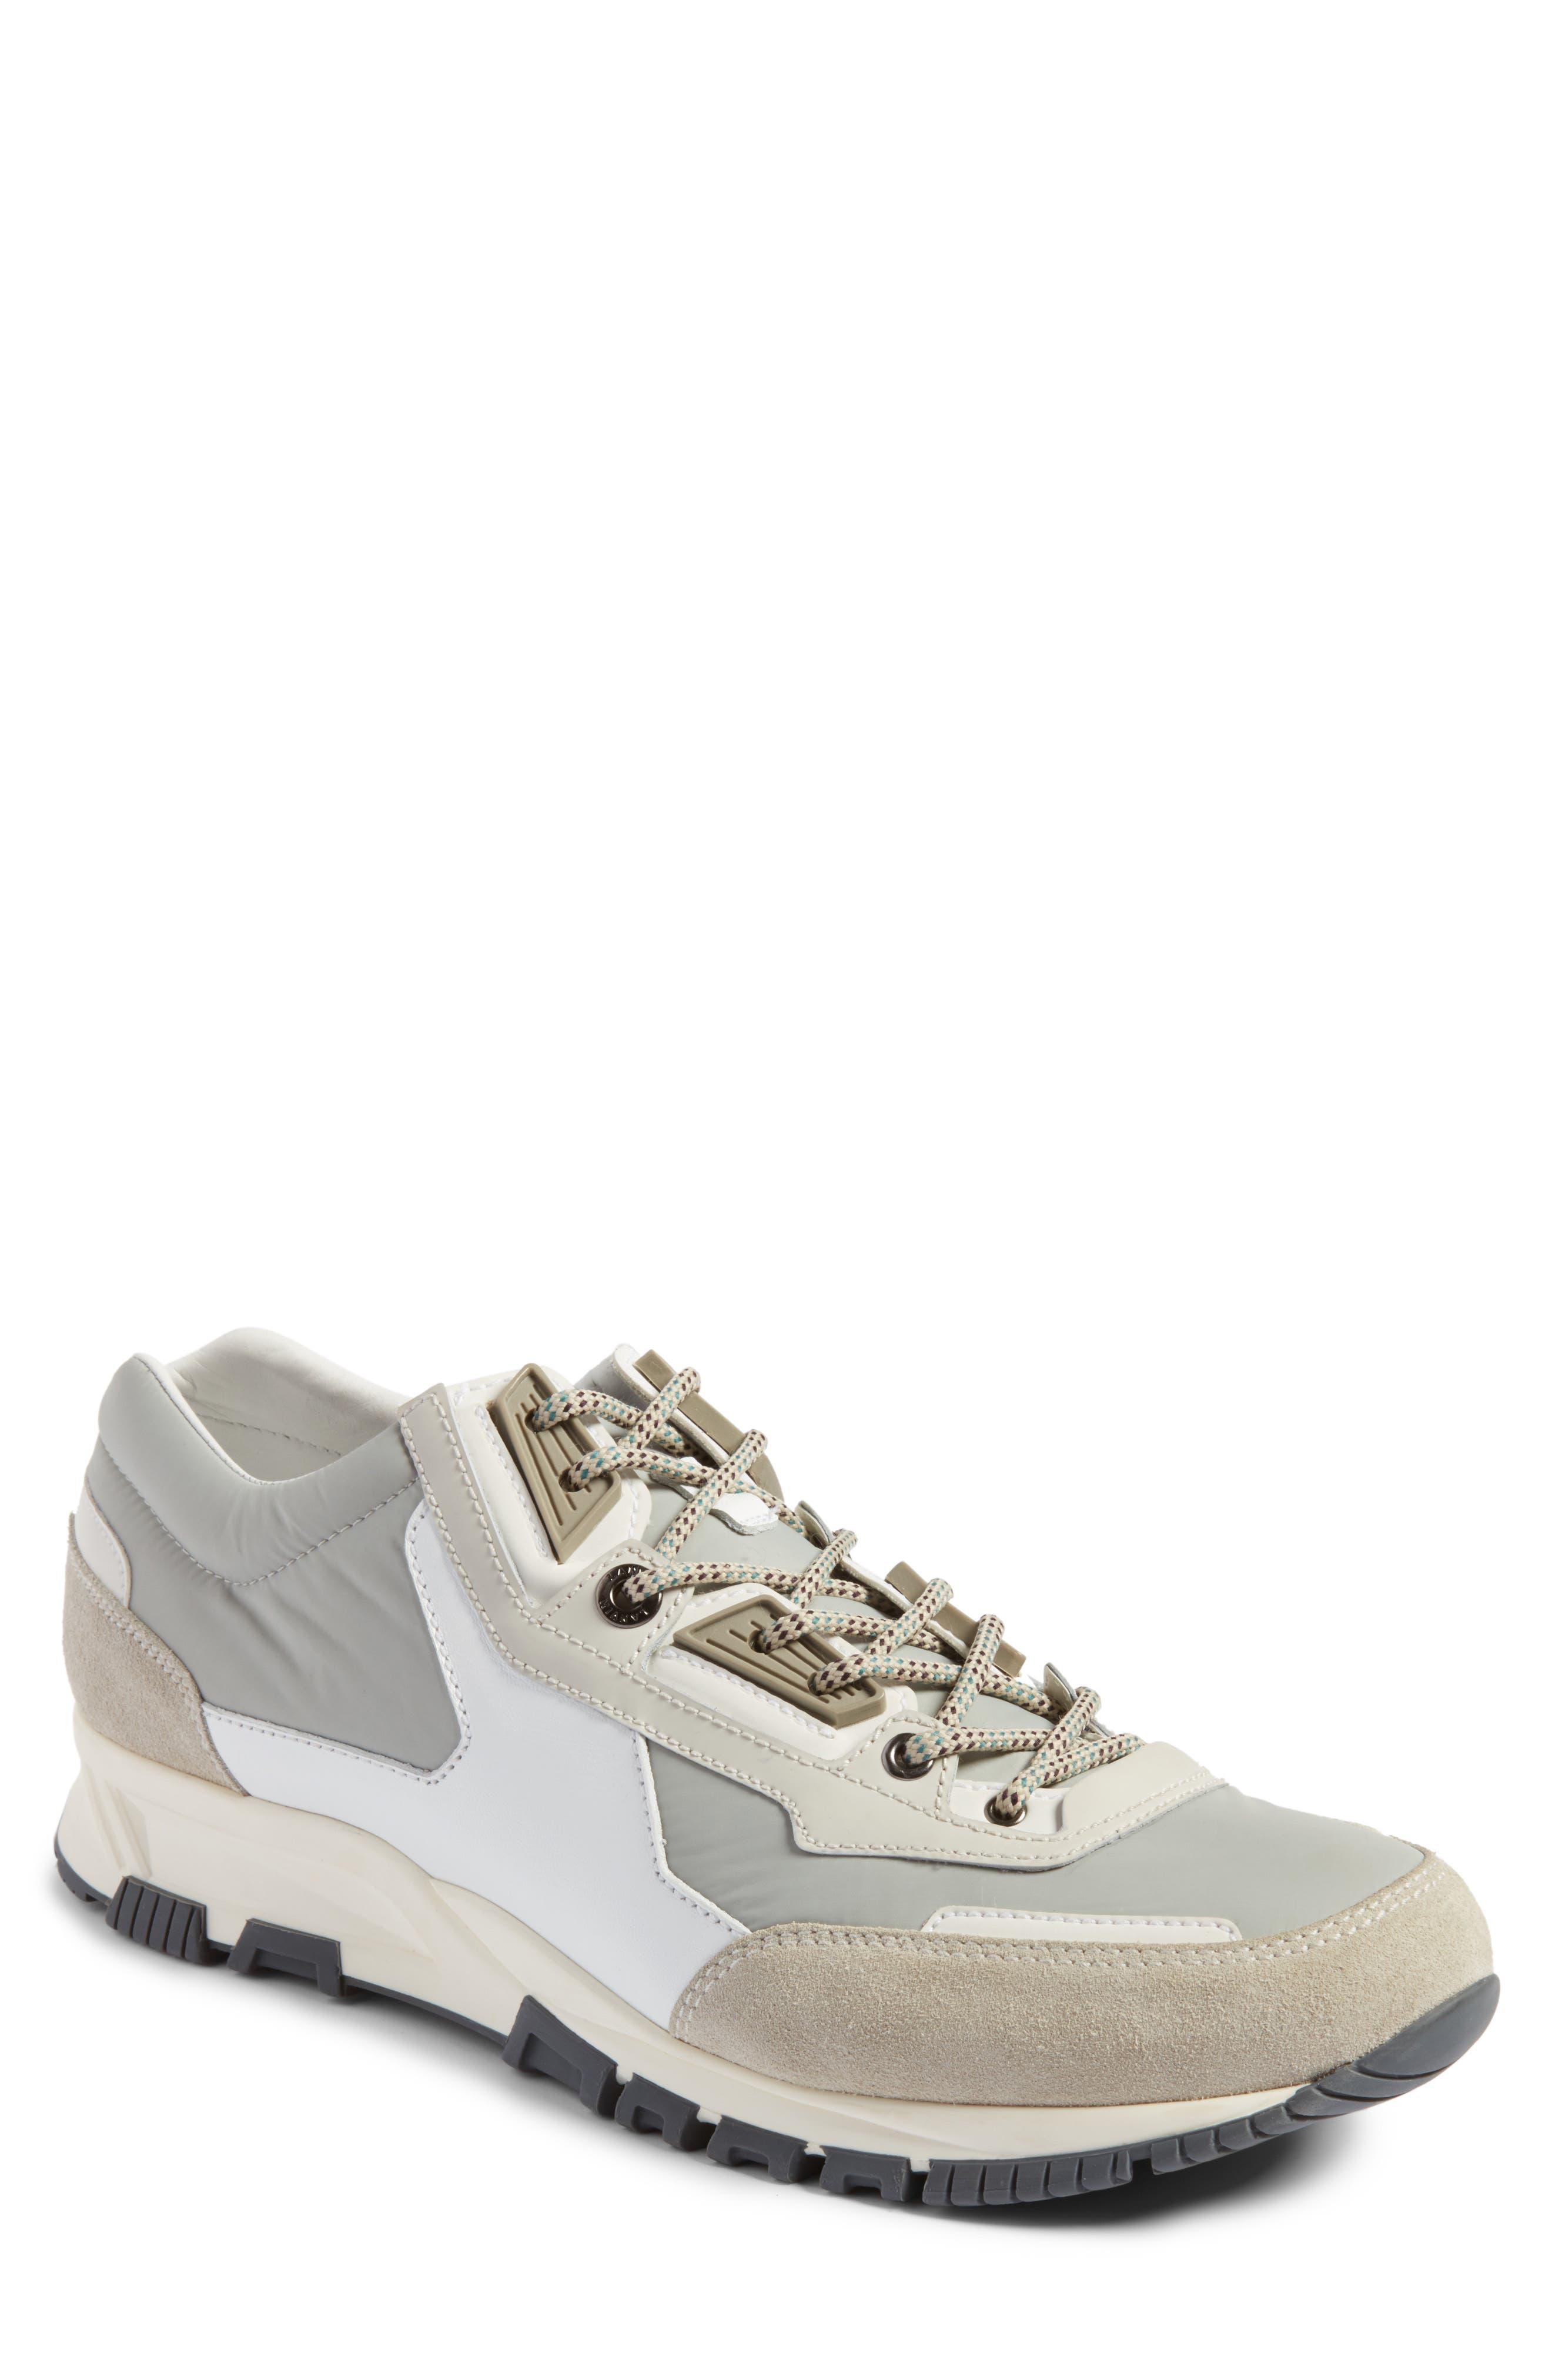 Main Image - Lanvin Running Sneaker (Men)